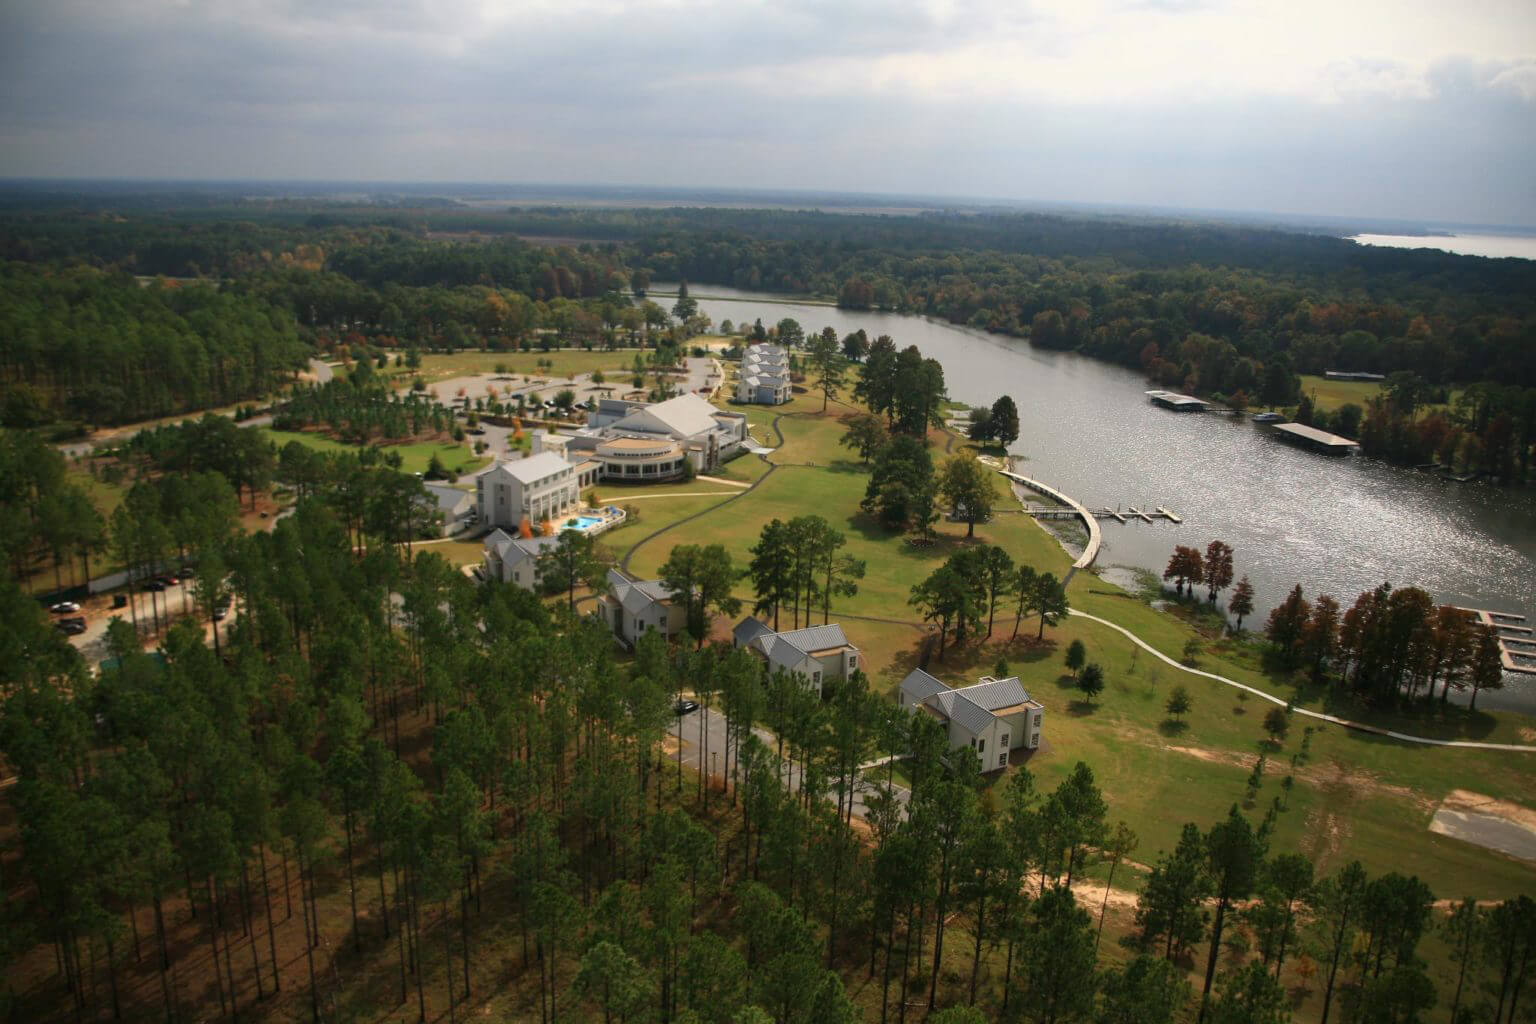 Home | Lake Blackshear Resort & Golf Club - Cordele, GA